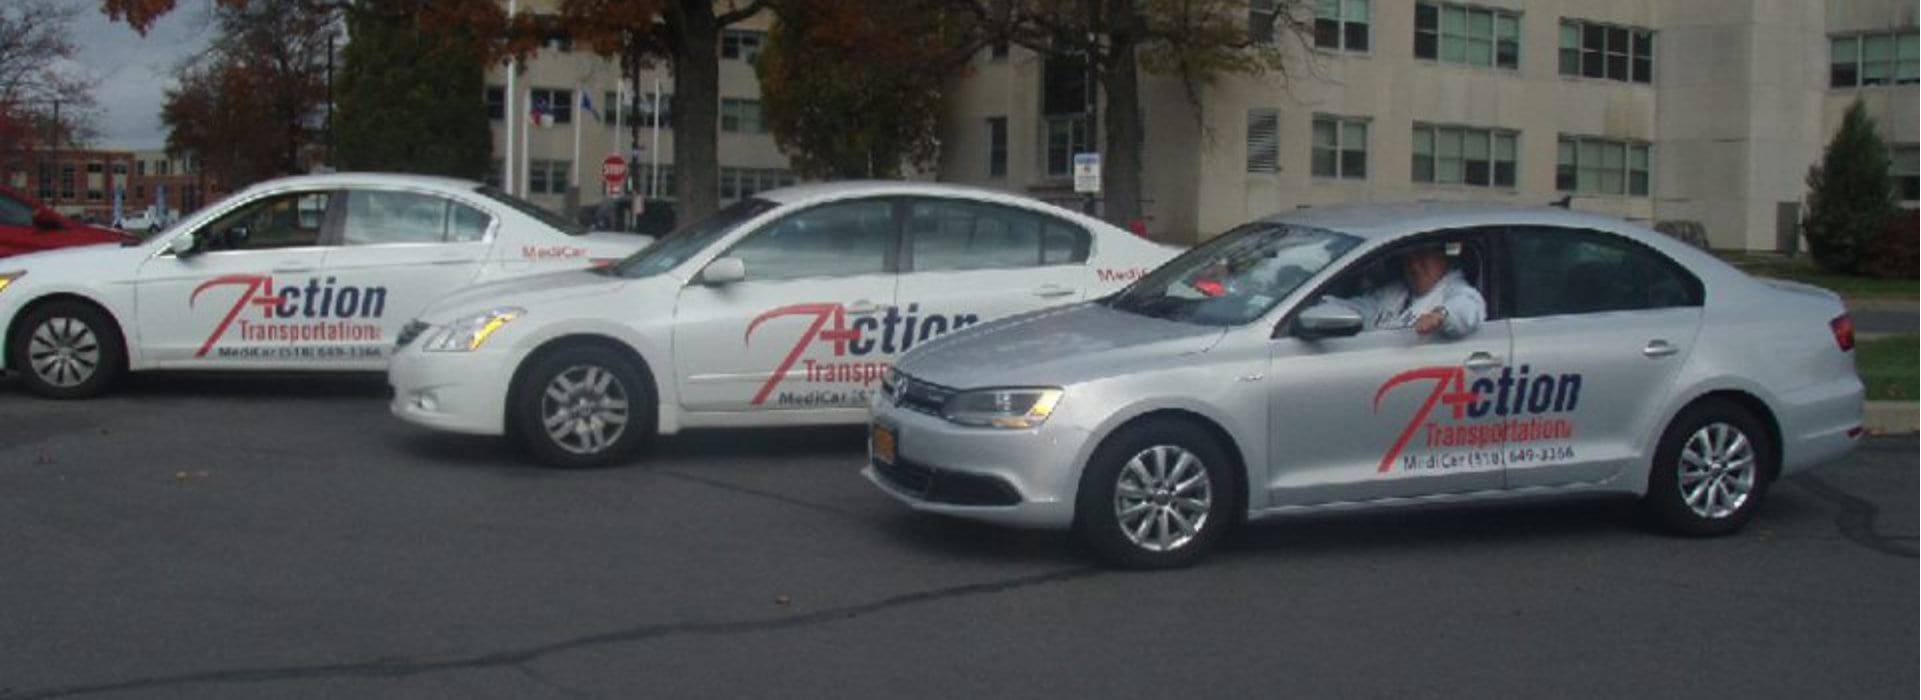 three car parking